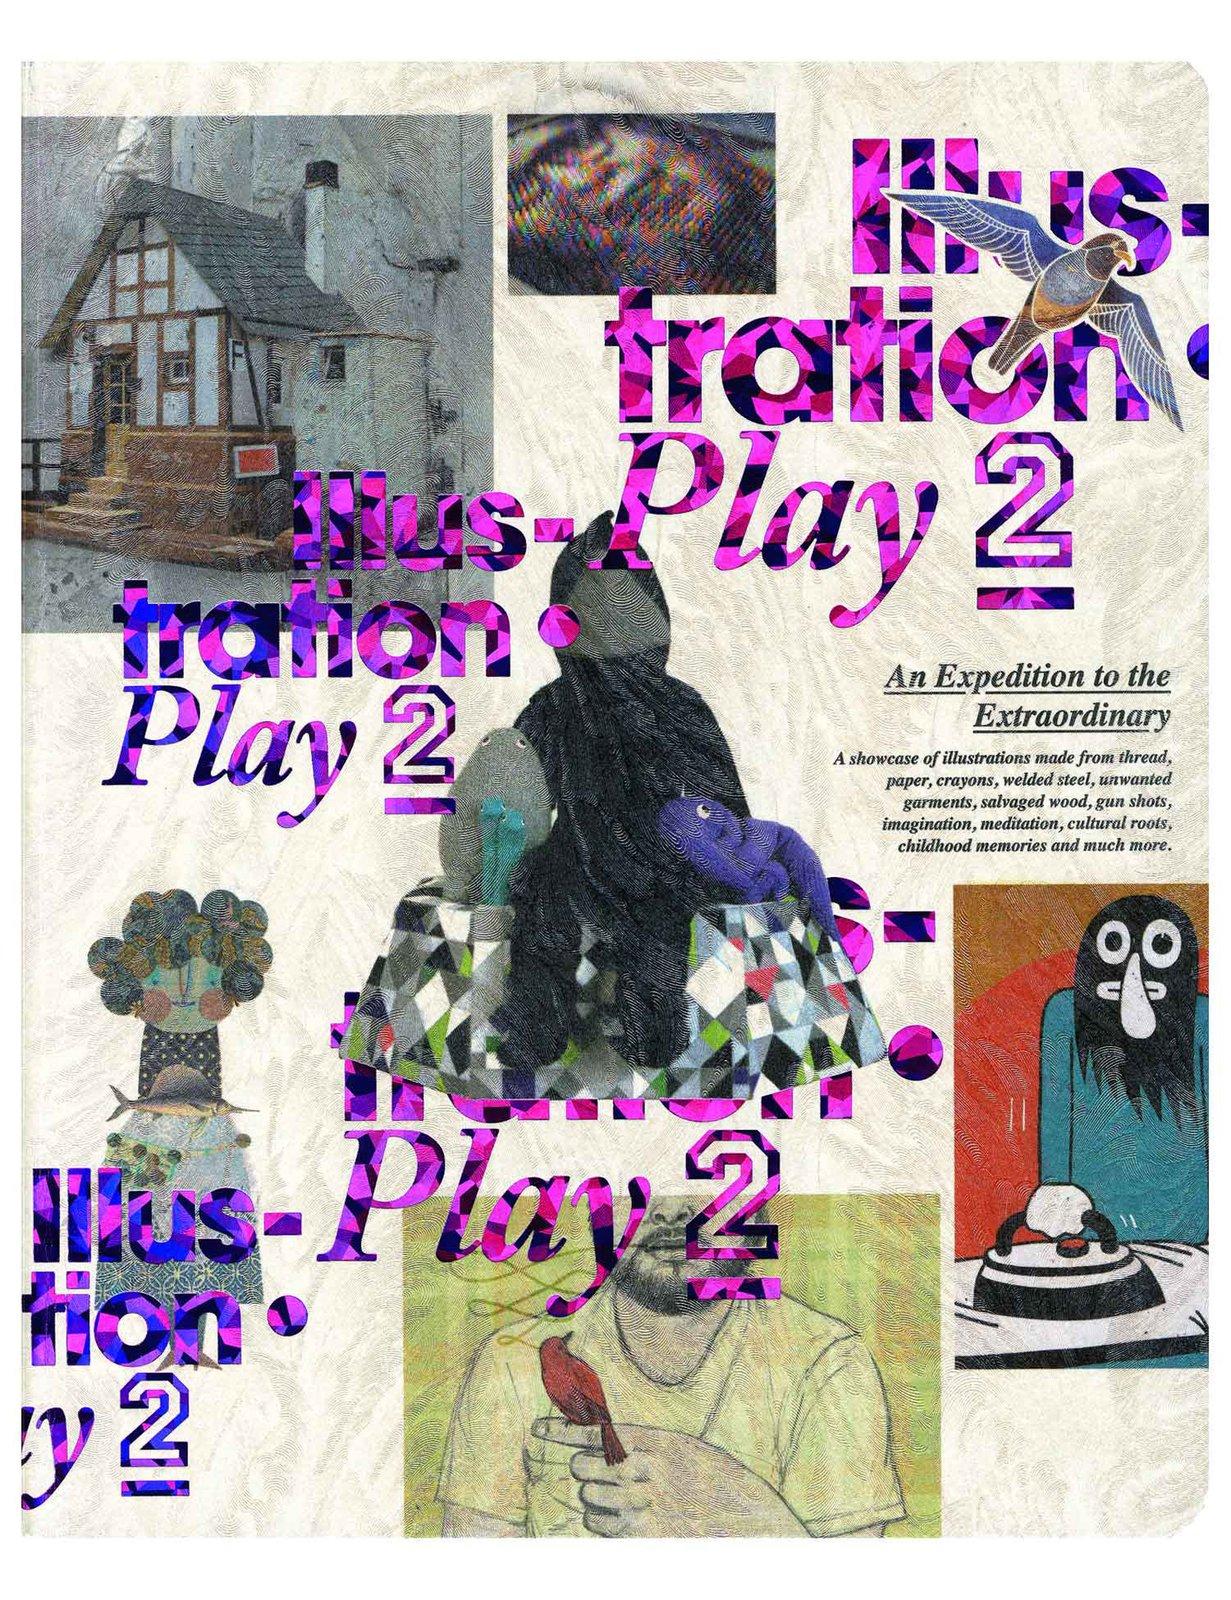 "Illustration Play 2 goes on sale September 6. For more information, visit victionary.com or gingkopress.com.  Search ""평창출장마사지-출장안마-출장-출장서비스 평창콜걸 출장샵 { ㅋr톡bc221 } 주소{ ☻sannhu,com } 평창 출장여대생 만남 출장만남 업소 타이마사지 출장샵추천 업소 평창출장샵 출장서비스 출장업소"" from Illustration Play 2"